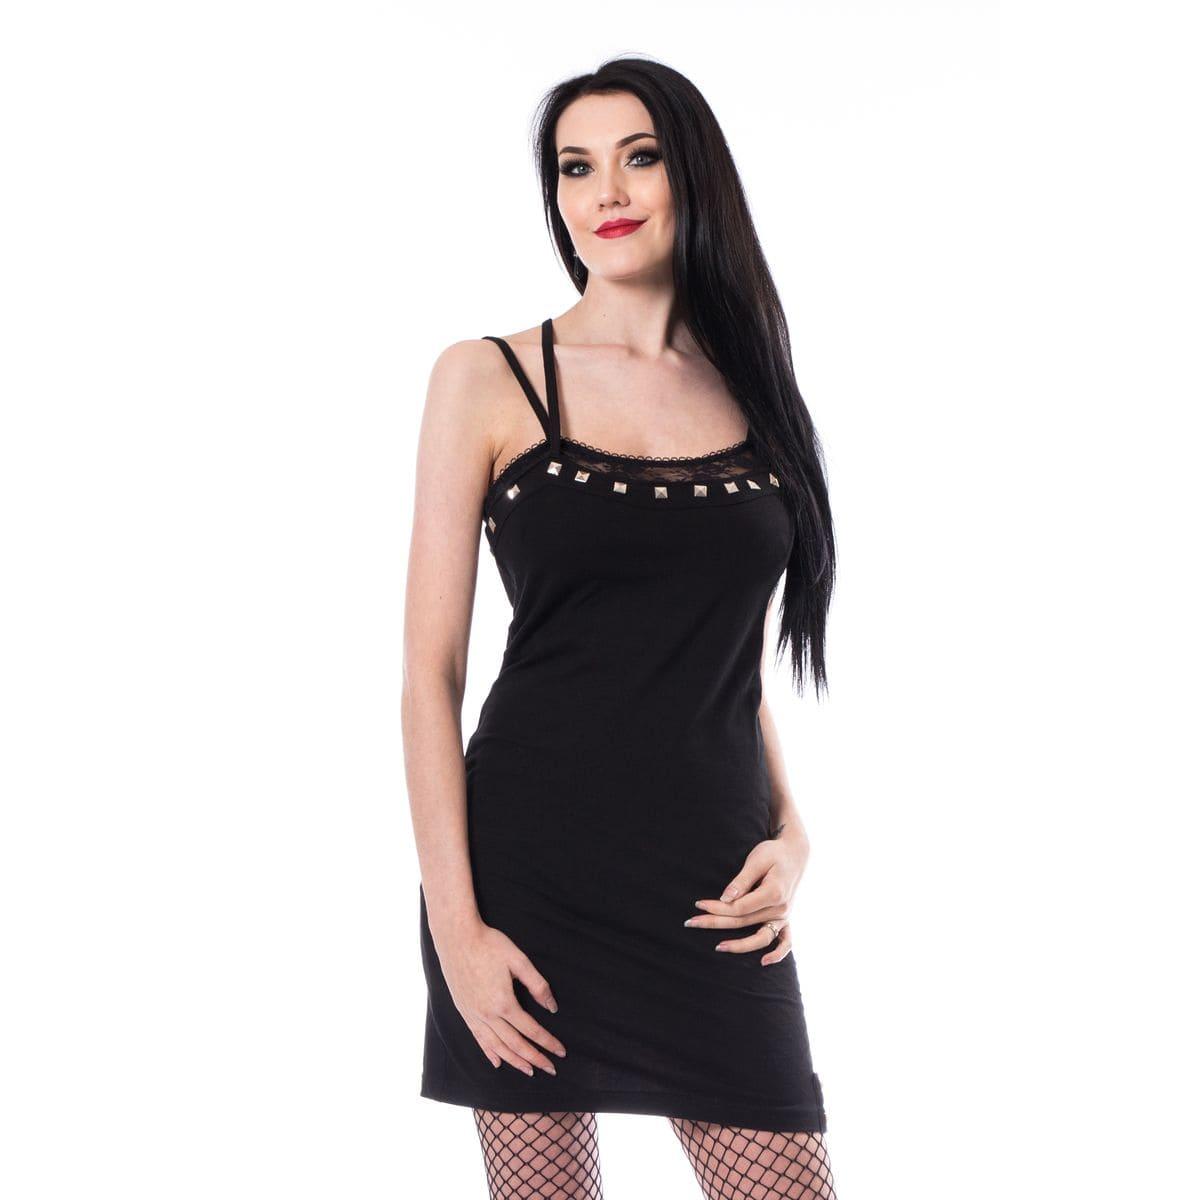 lova dress: schwarzes kurzes trägerkleid |